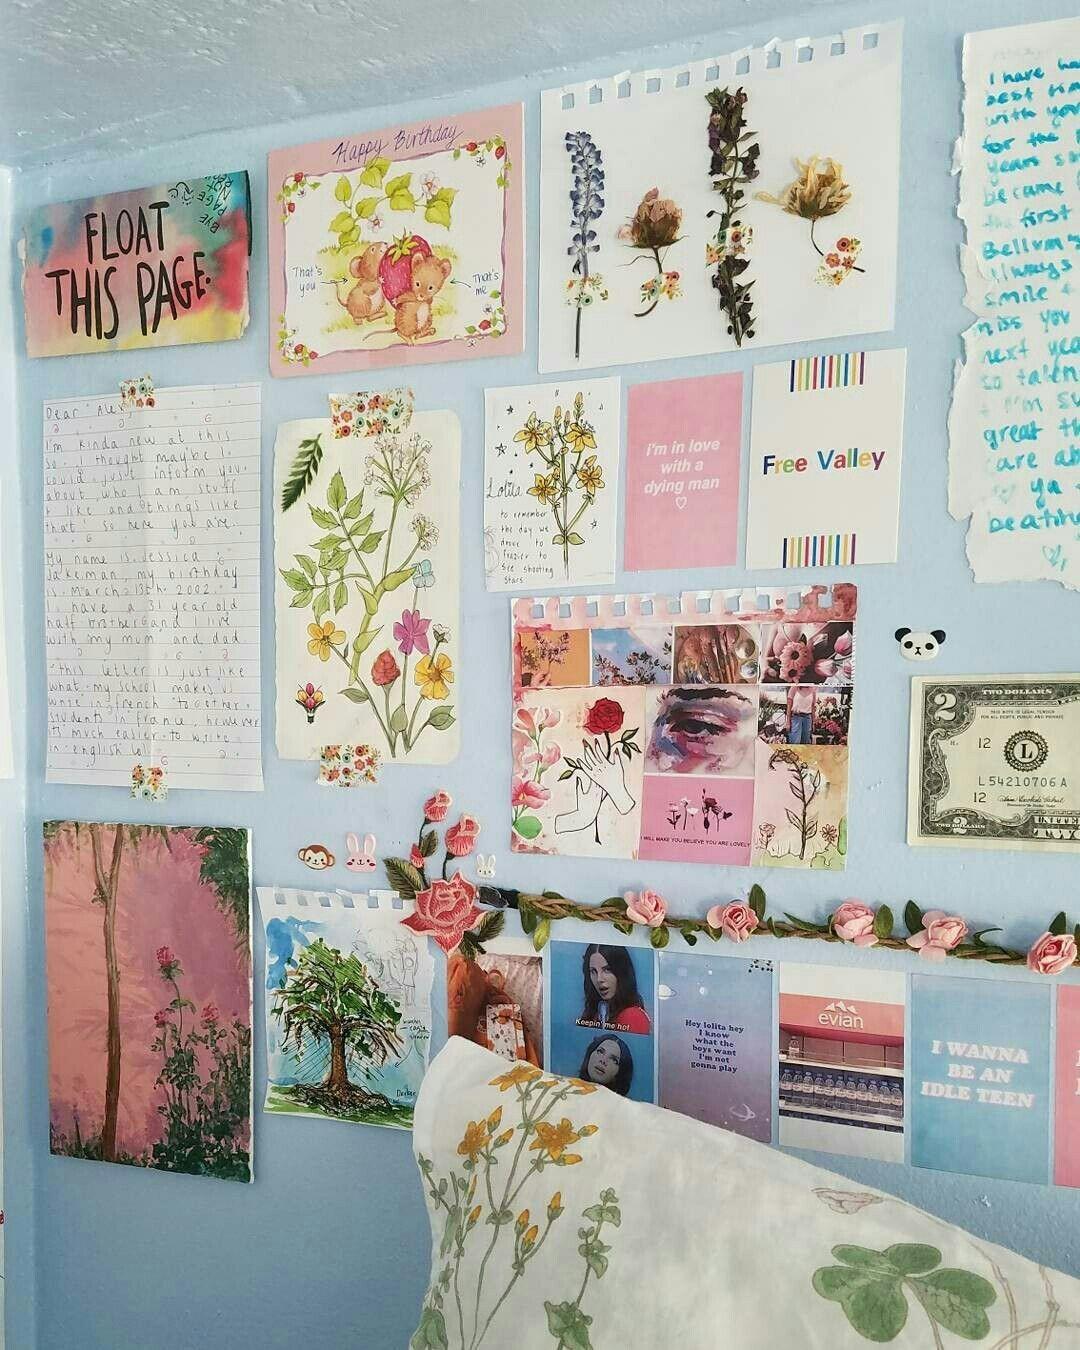 Aesthetic Dorm Room: Pin By Chloe Zickefoose On Dorm